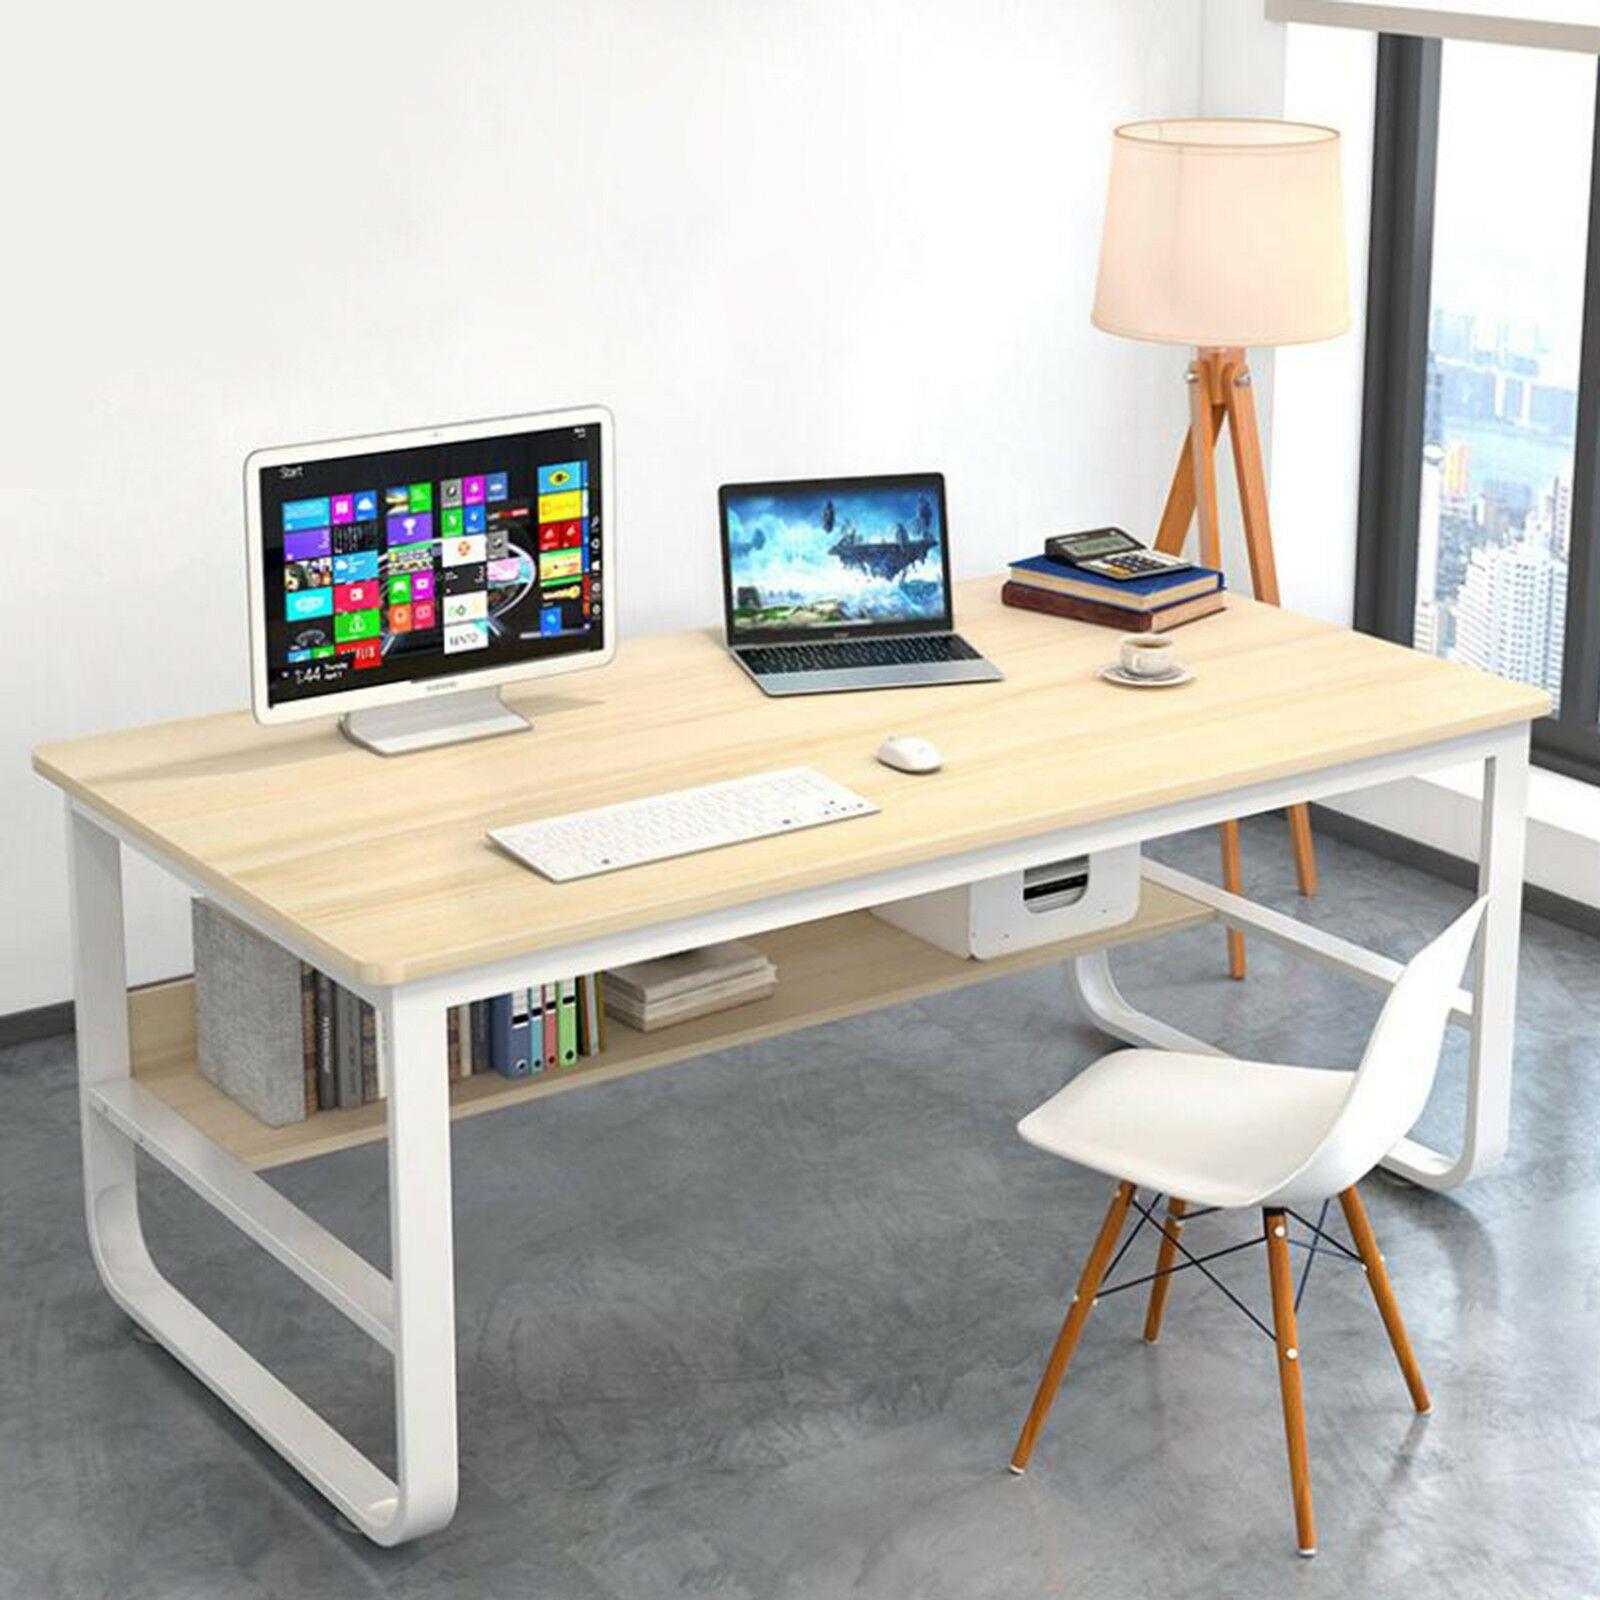 - Computer Desk Laptop PC & Bookshelf Table Workstation Office Home